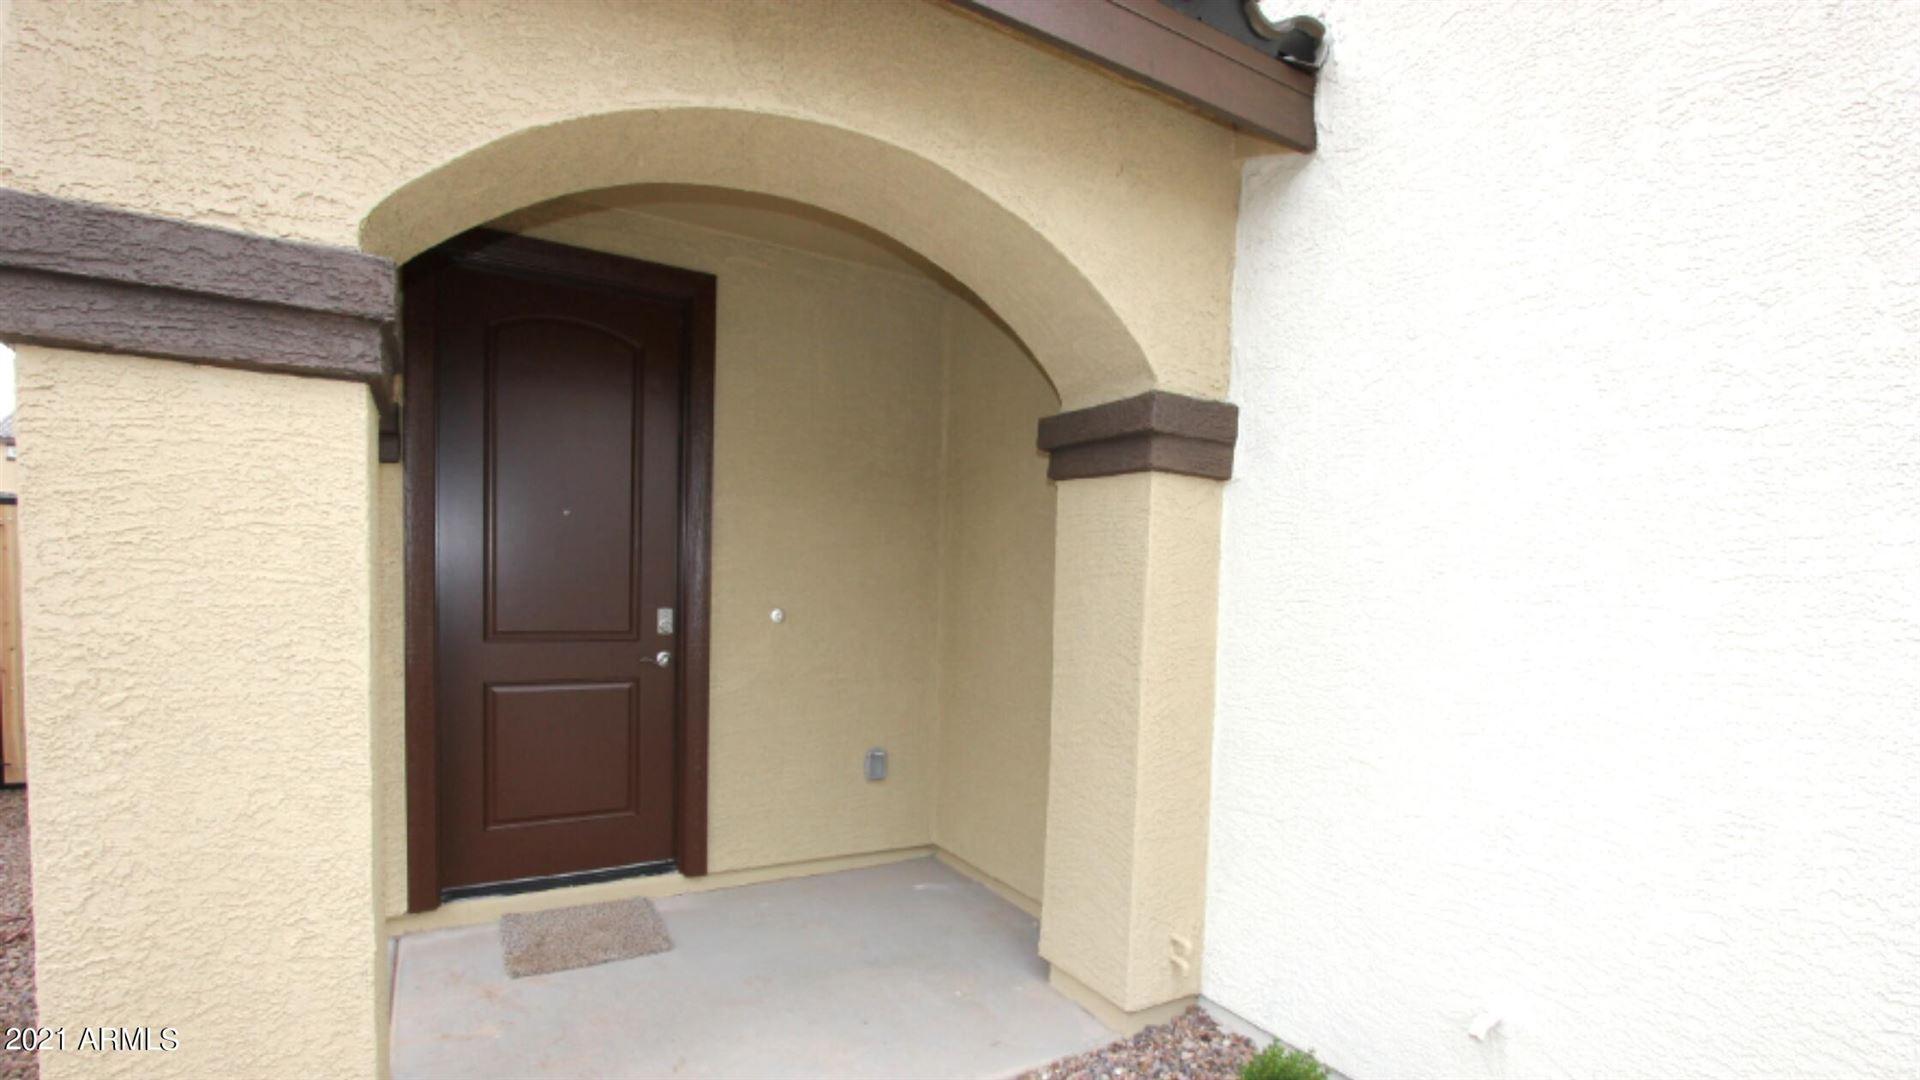 Photo of 1273 N ARIZONA Avenue, Chandler, AZ 85225 (MLS # 6232089)